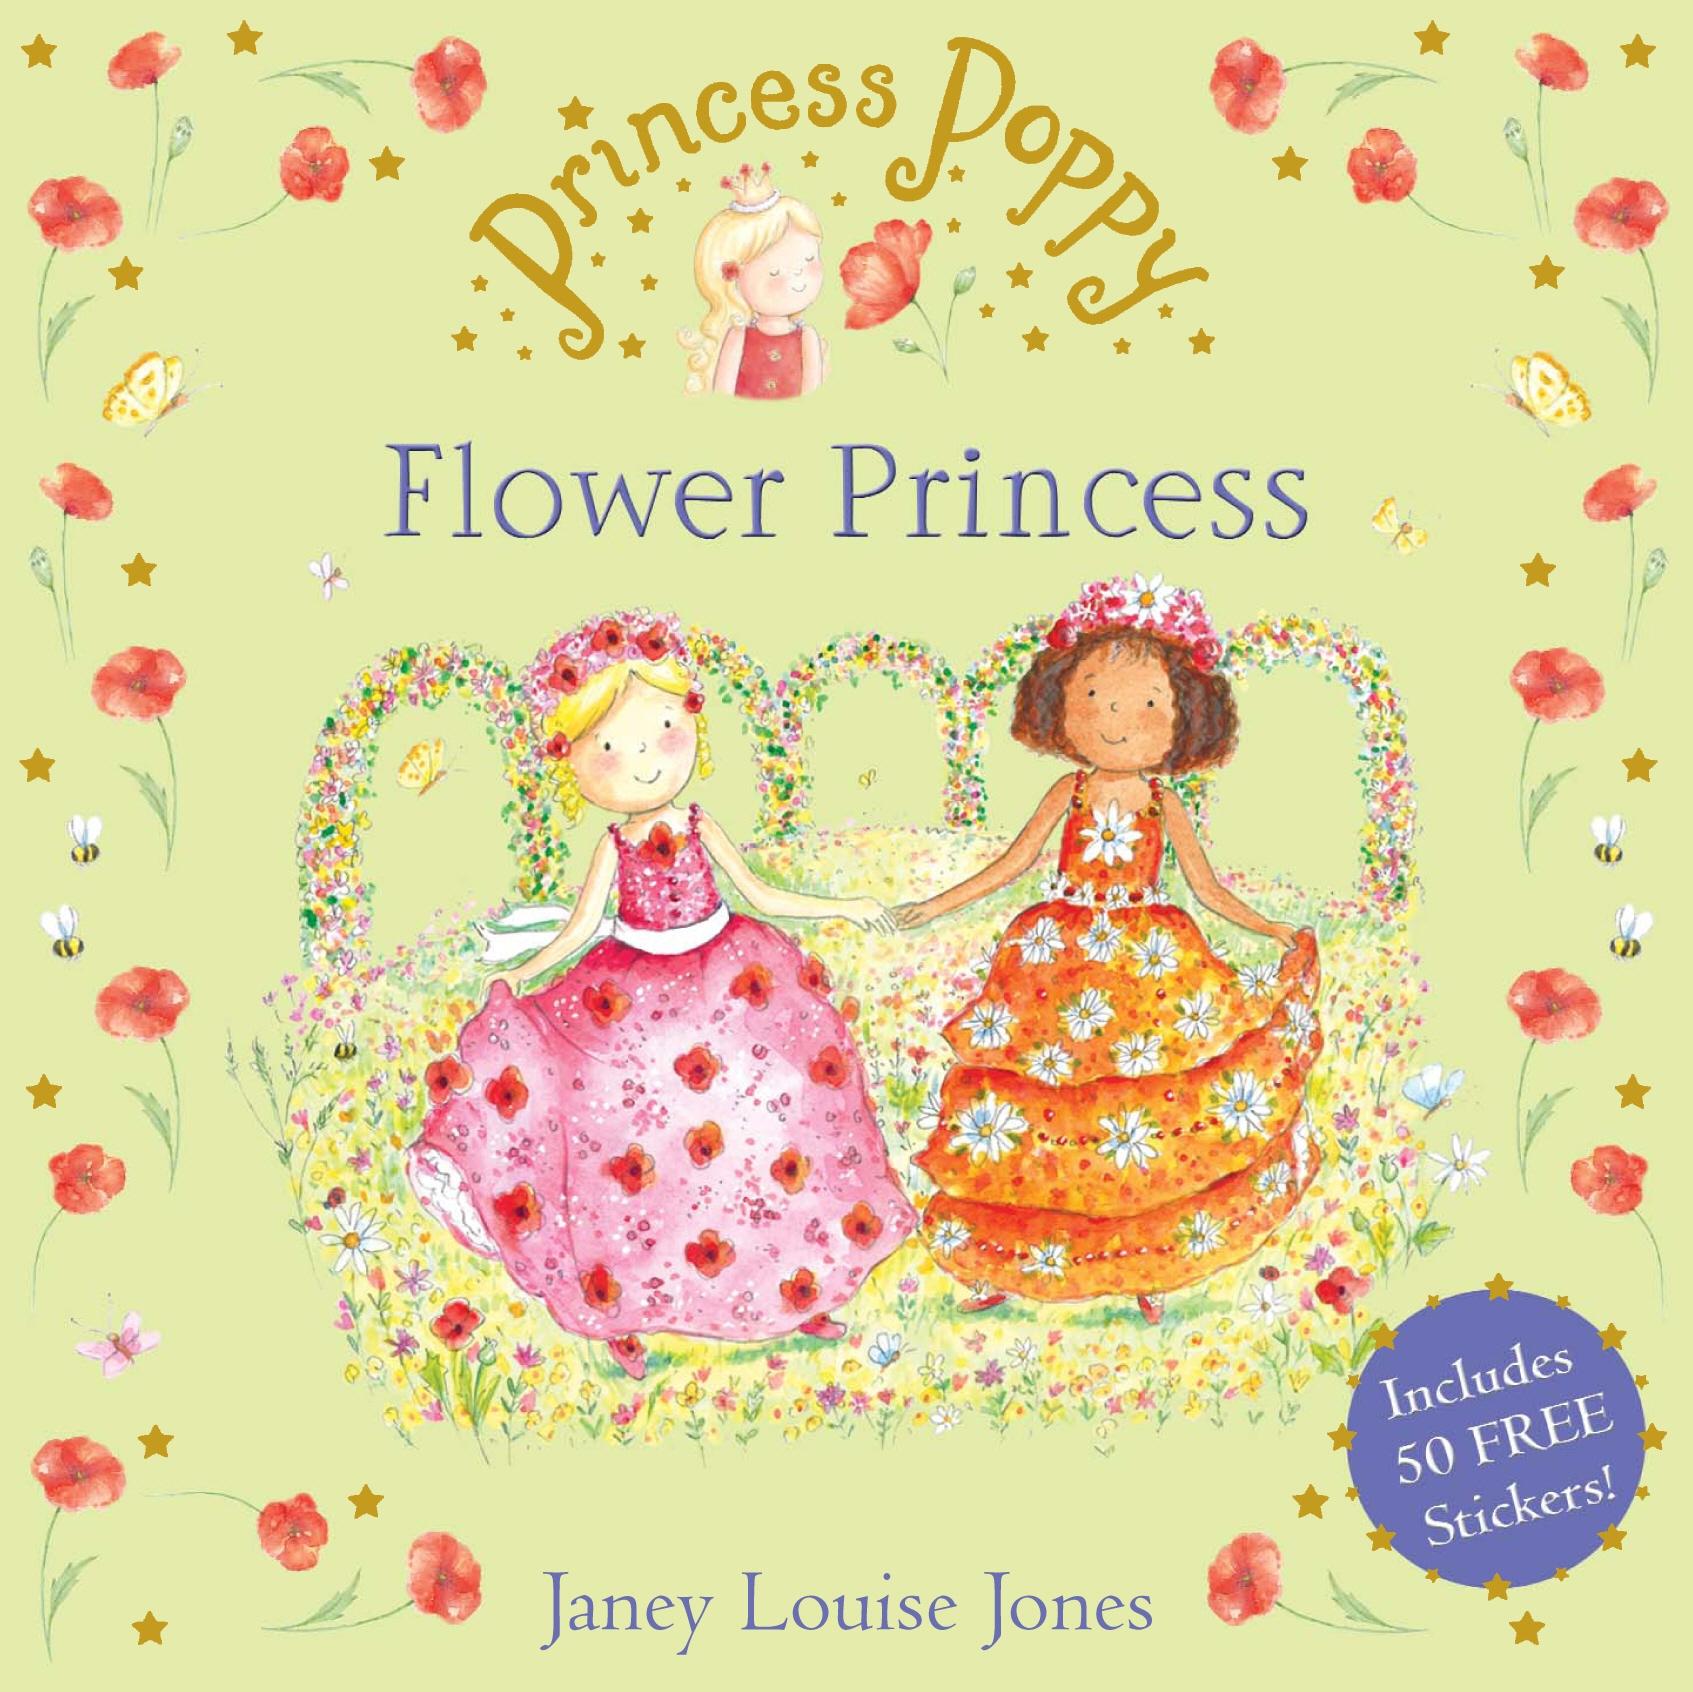 Princess Poppy The Flower Princess By Janey Louise Jones Penguin